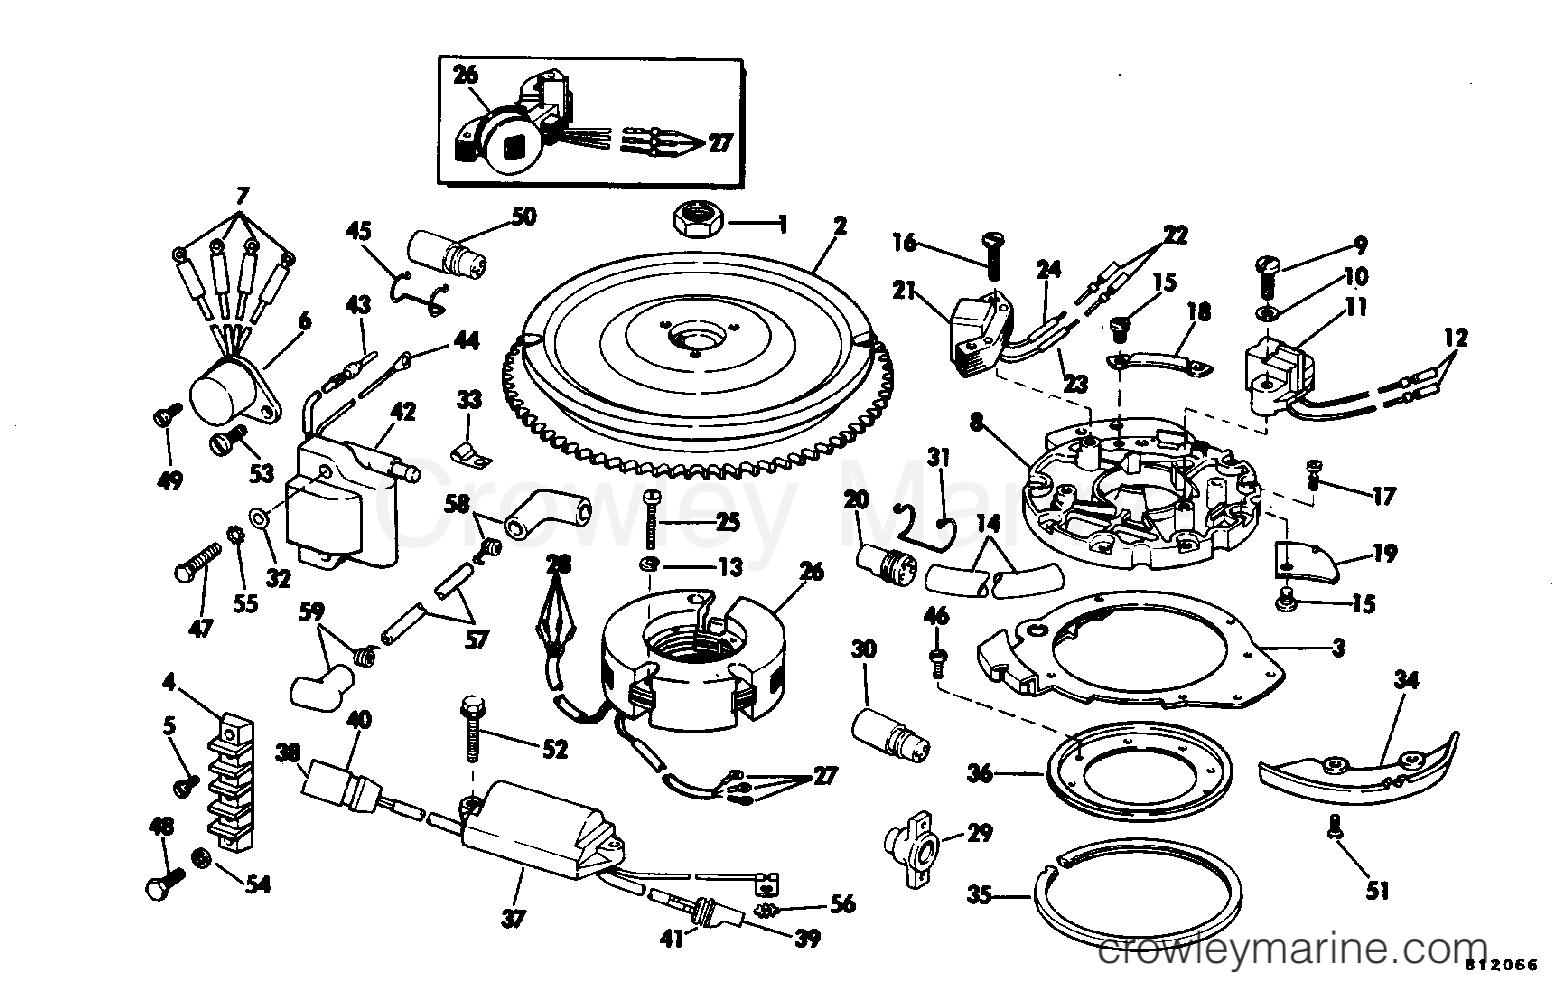 1981 Evinrude Outboards 25 - E25ECIB MAGNETO section